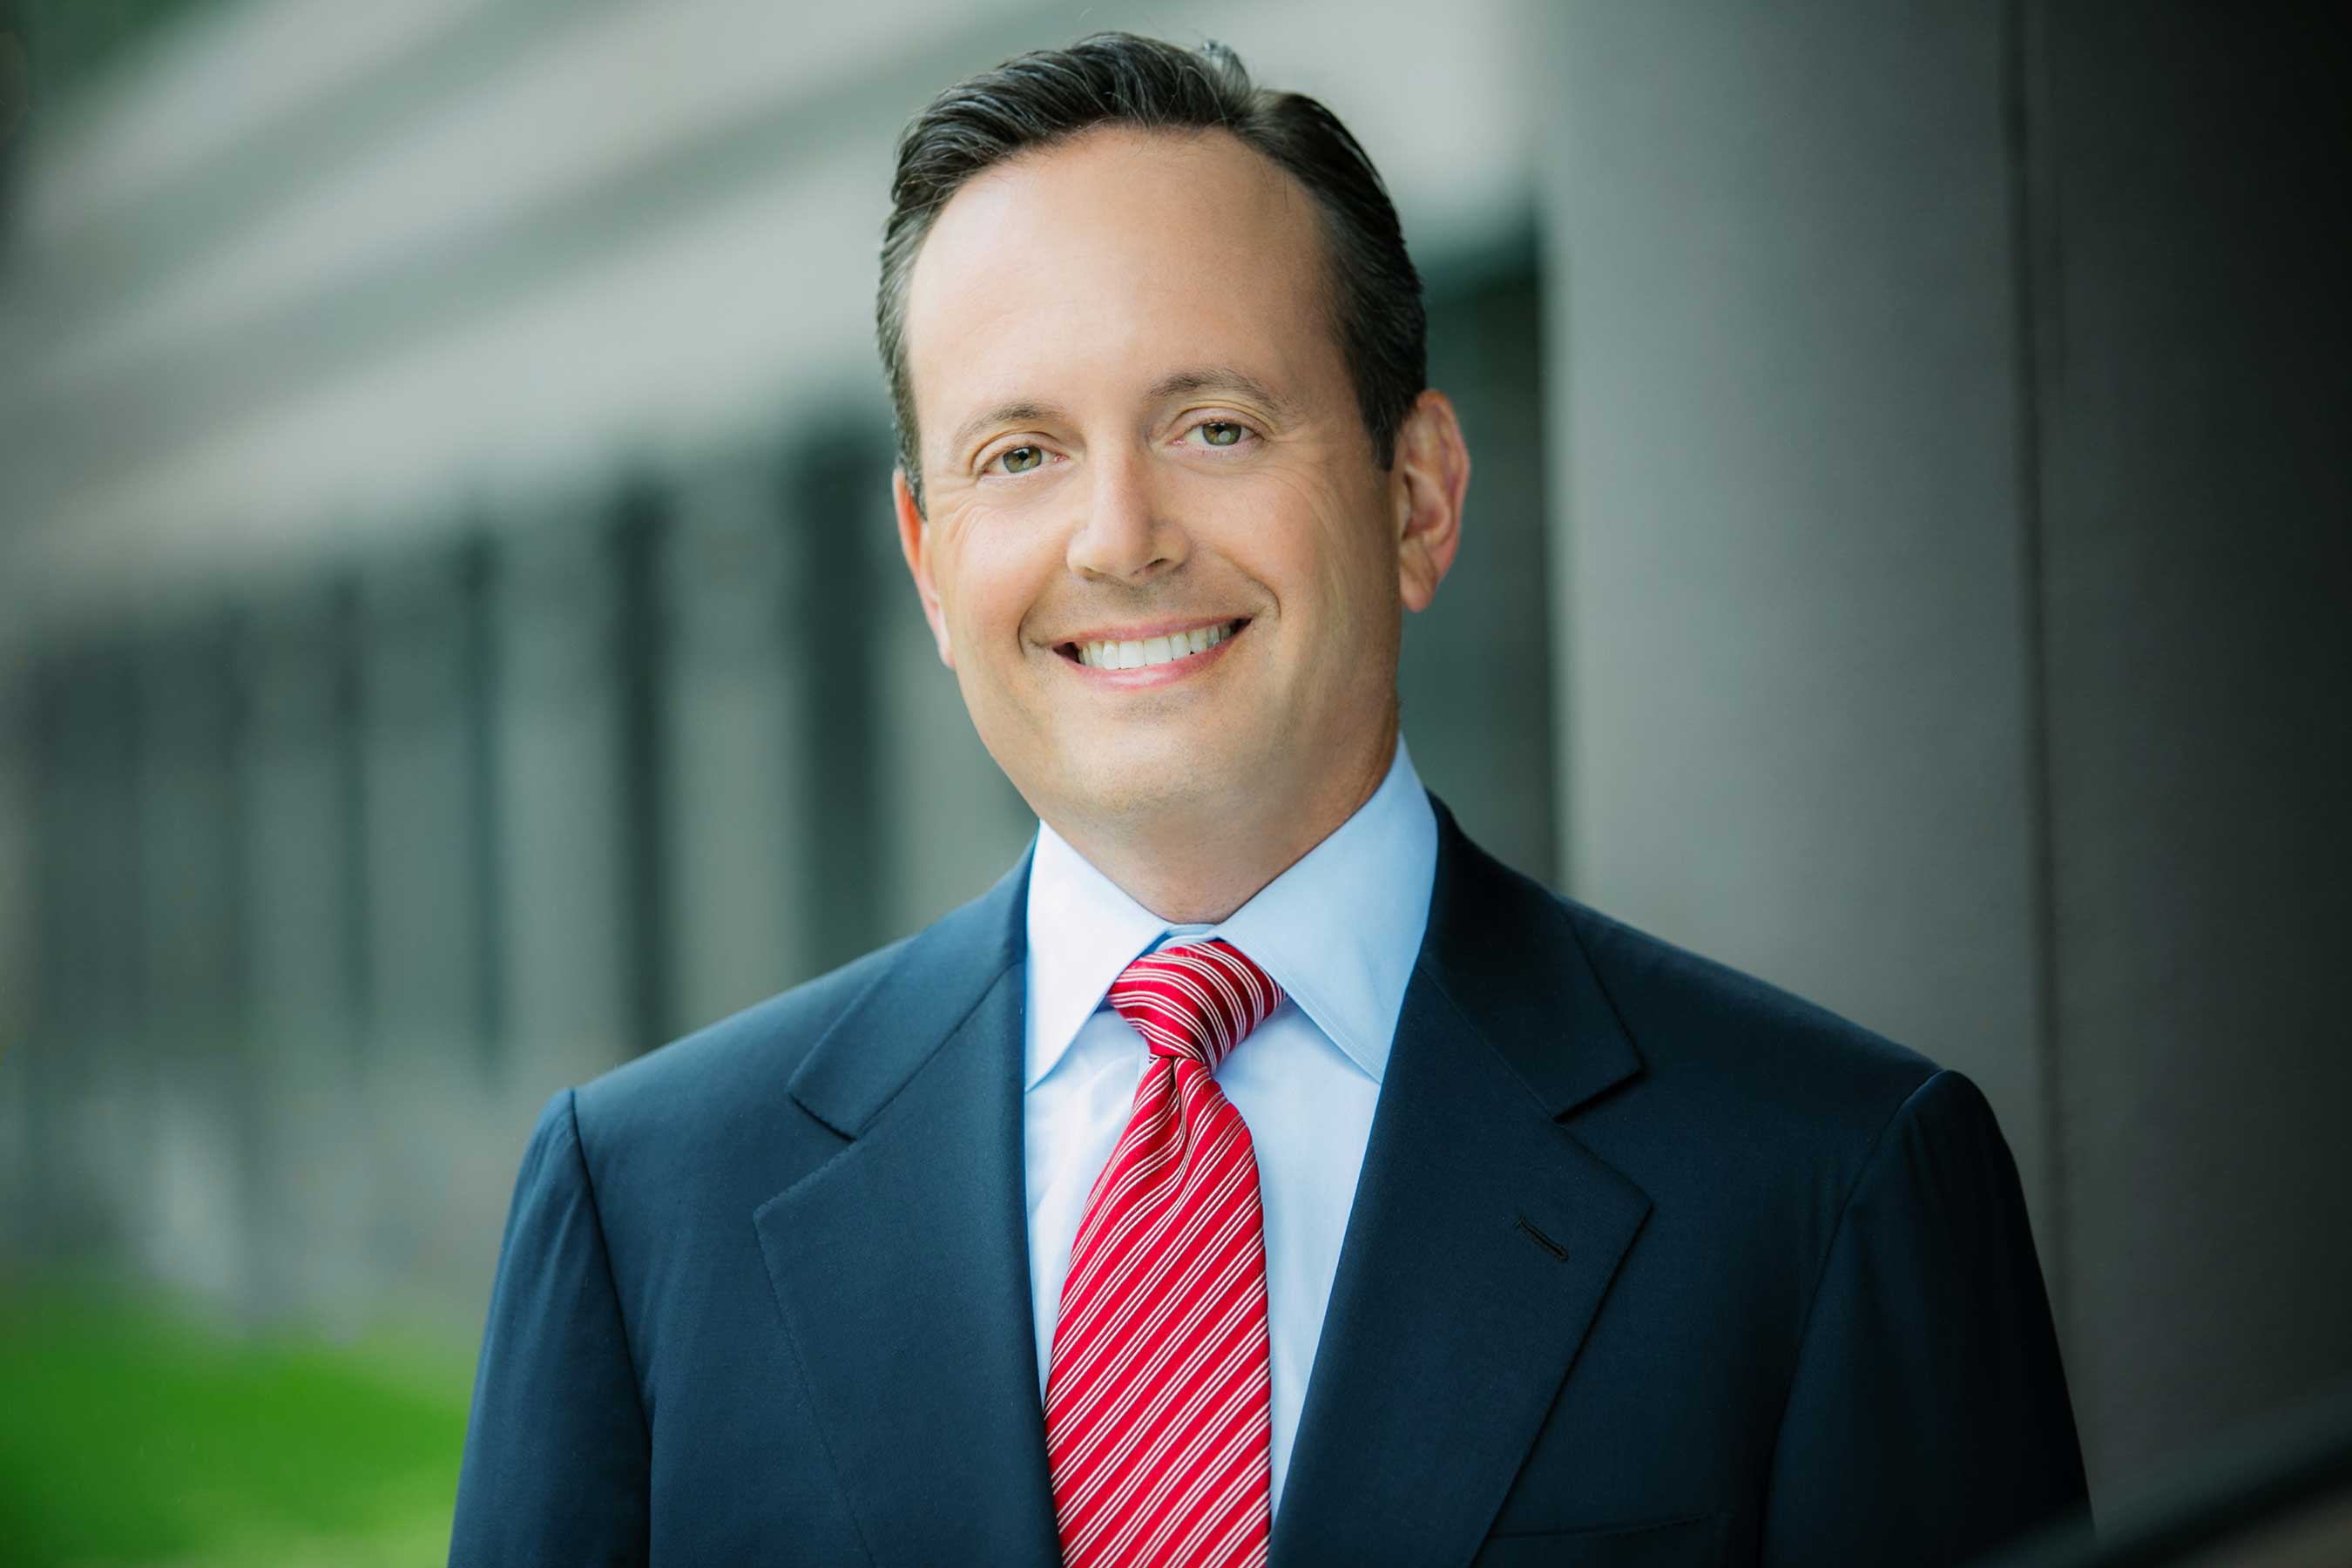 Brent Saunders Photo – Brent Saunders, President & CEO, Actavis